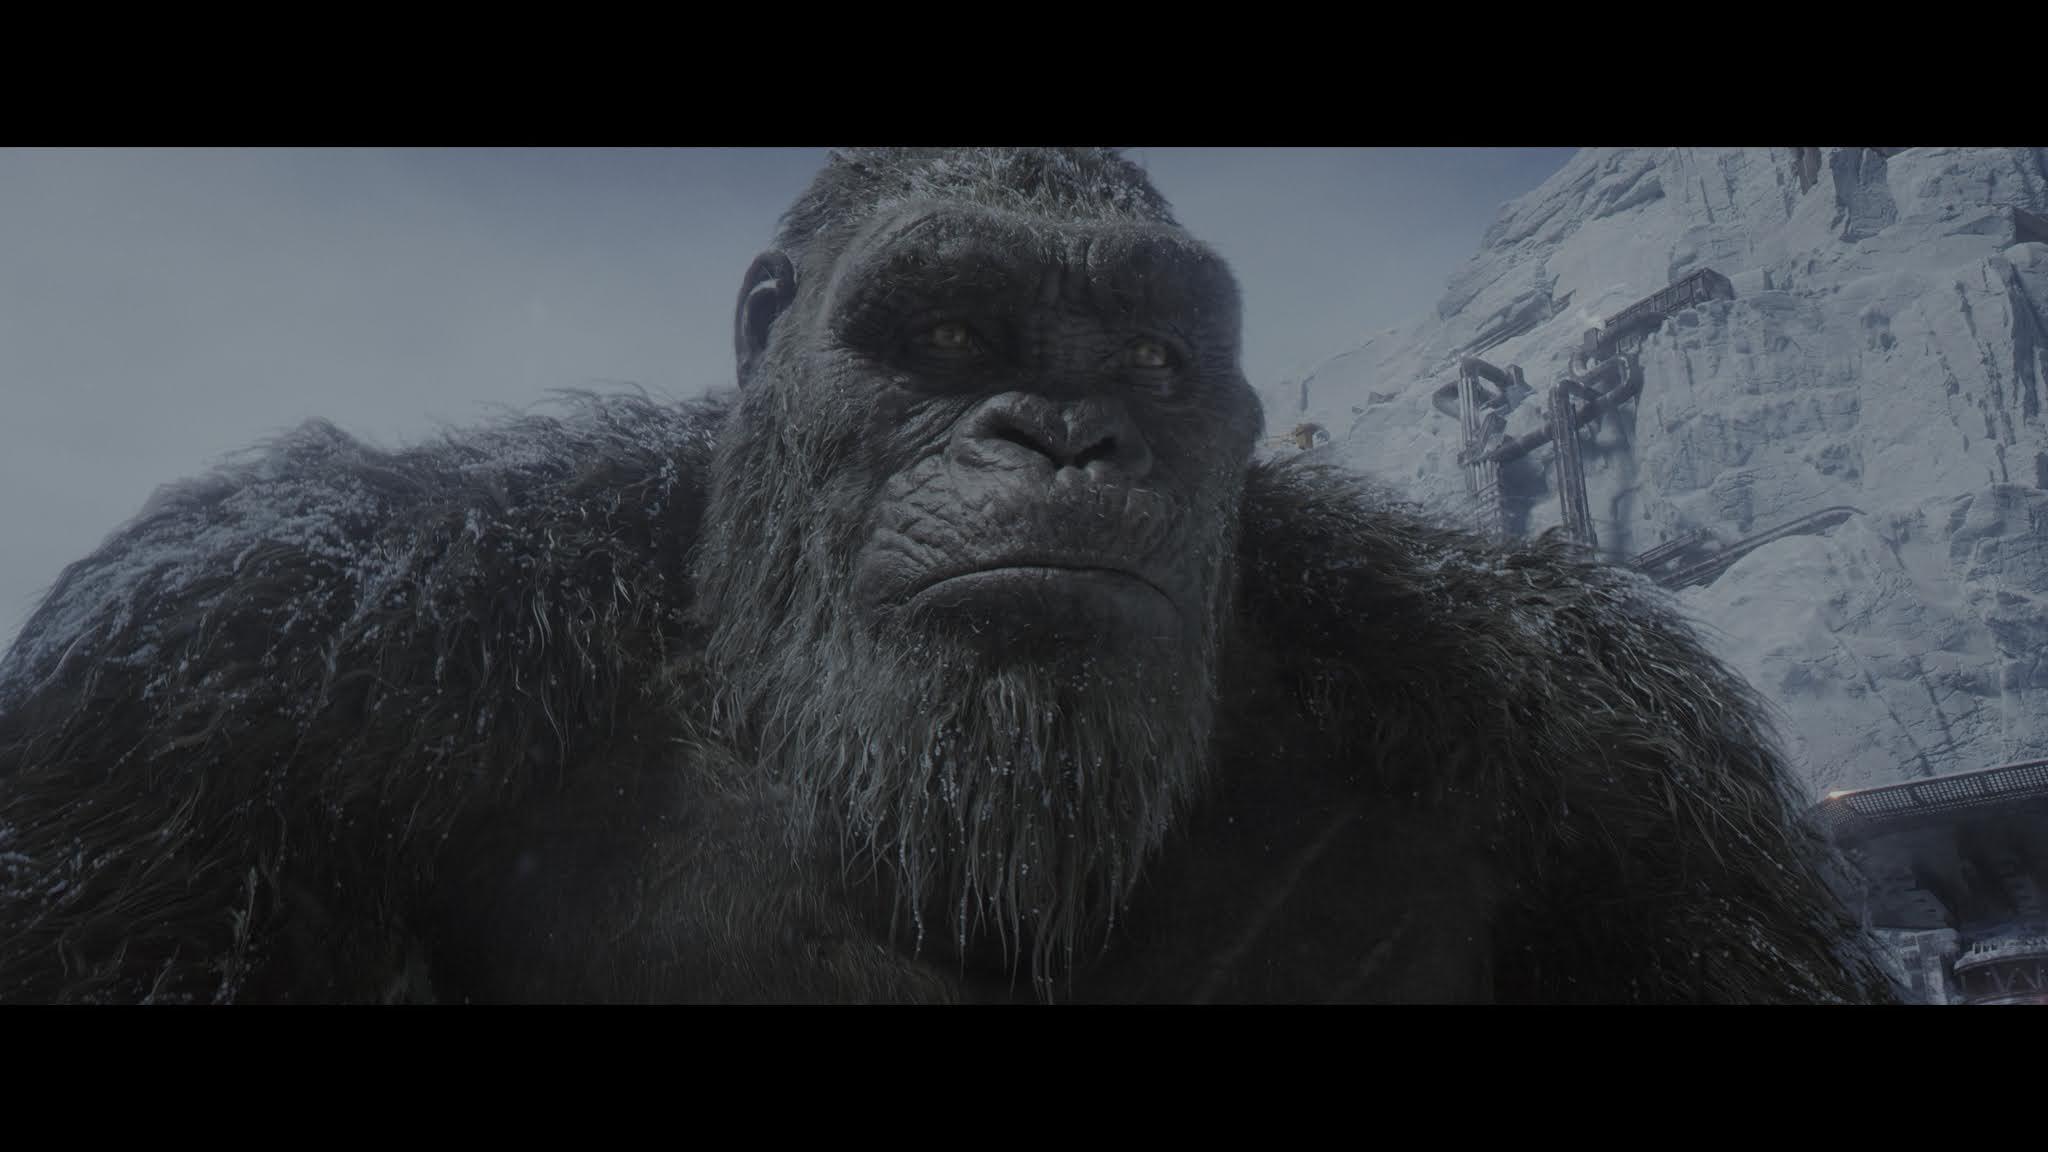 Godzilla vs Kong (2021) 4K WEB-DL HDR Latino